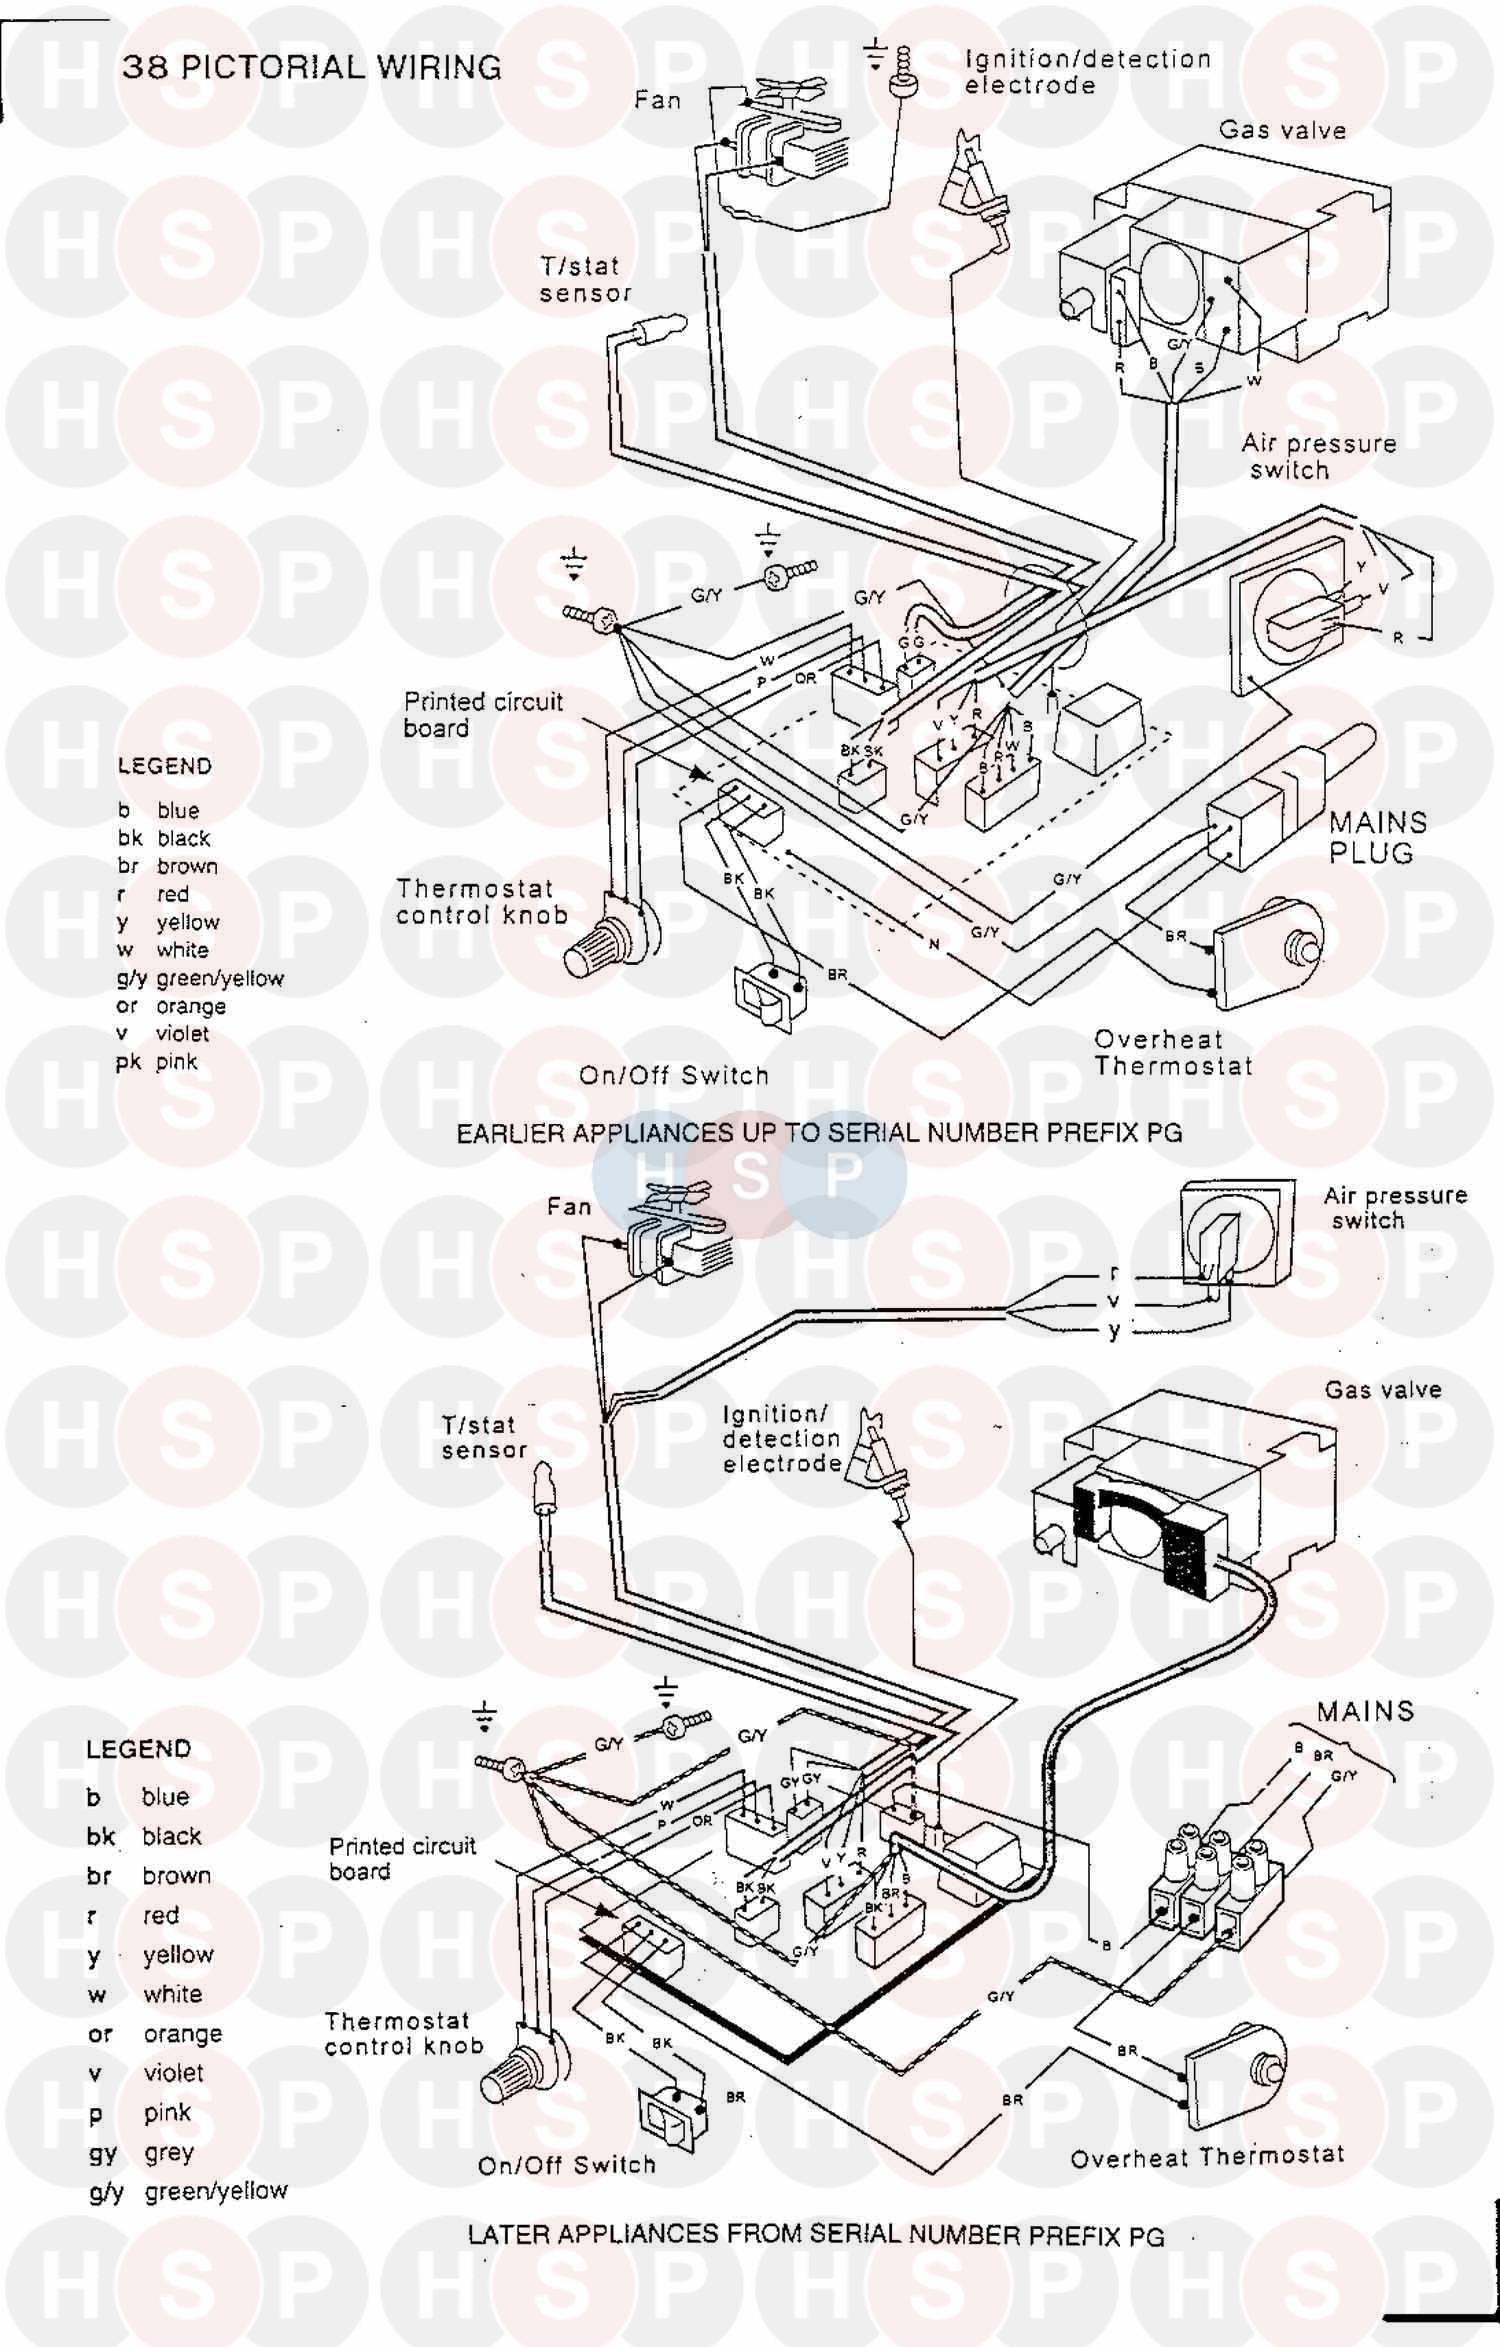 Ideal Classic Lx Ff 250p  Wiring Diagram 1 Diagram